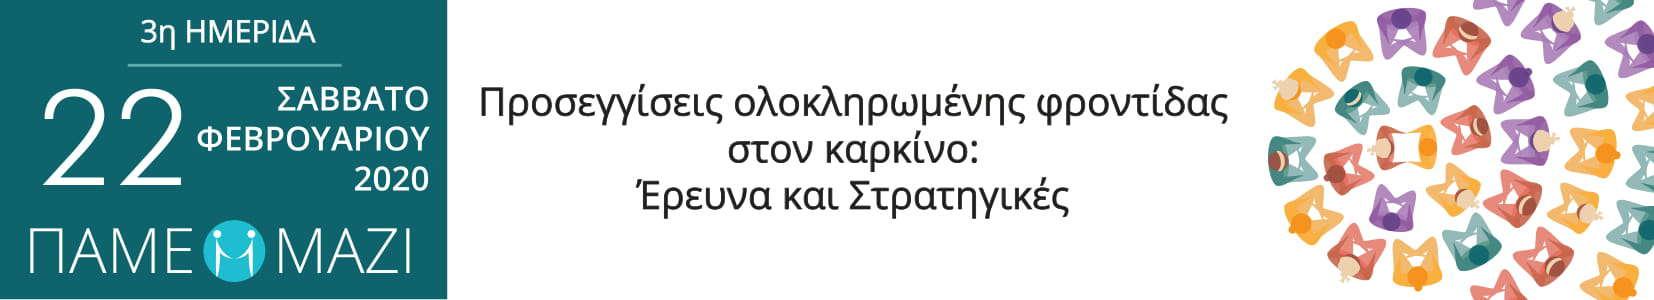 Web Banner_GR-1